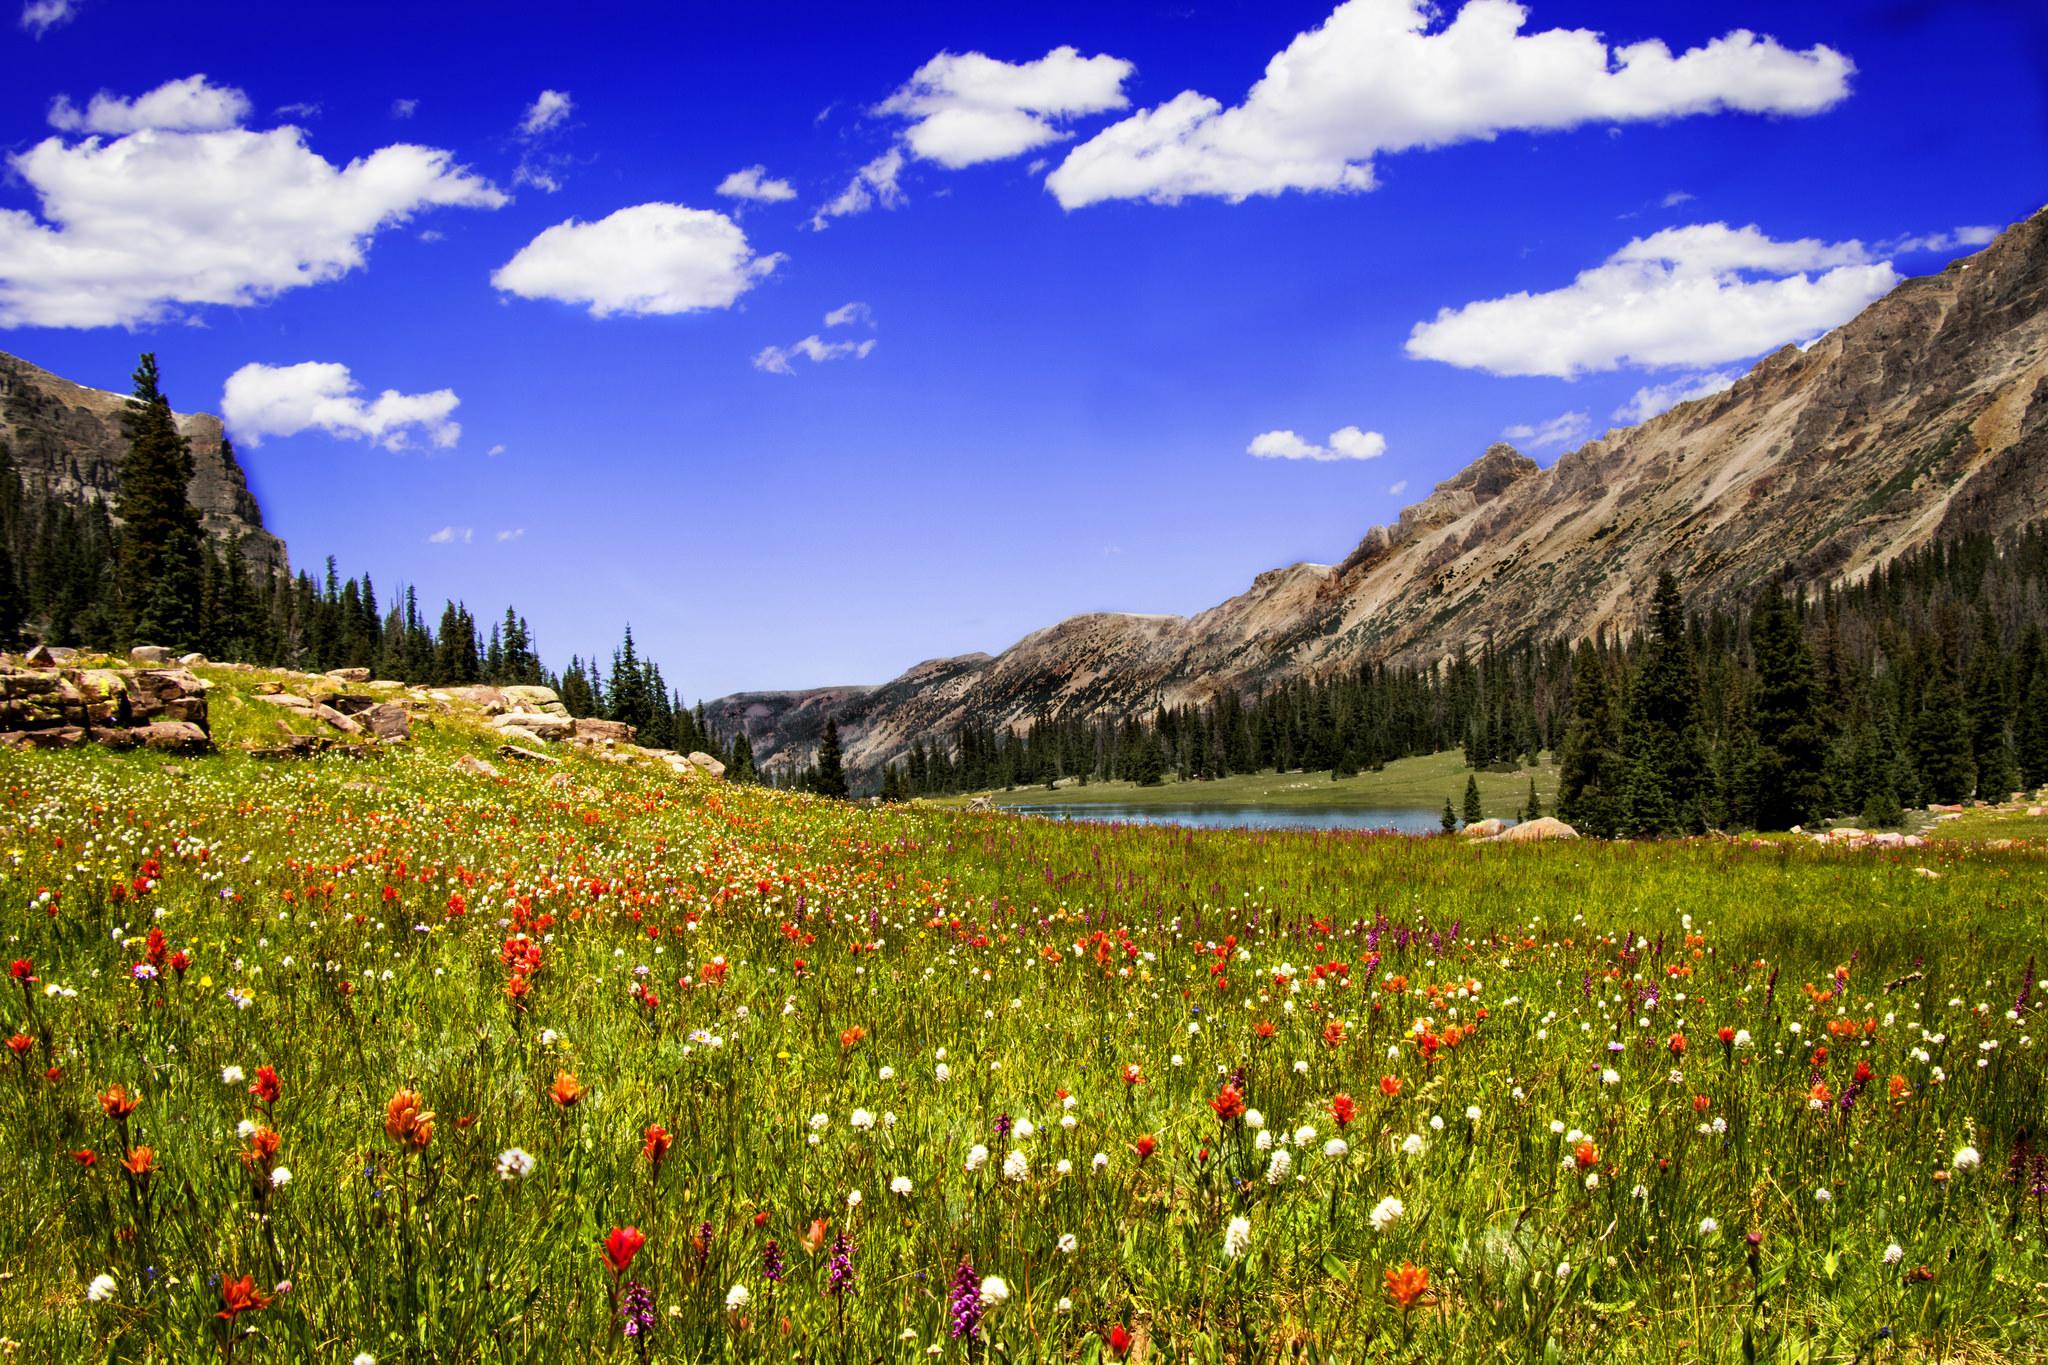 Облака, трава, цветы, озеро  № 1963092 бесплатно